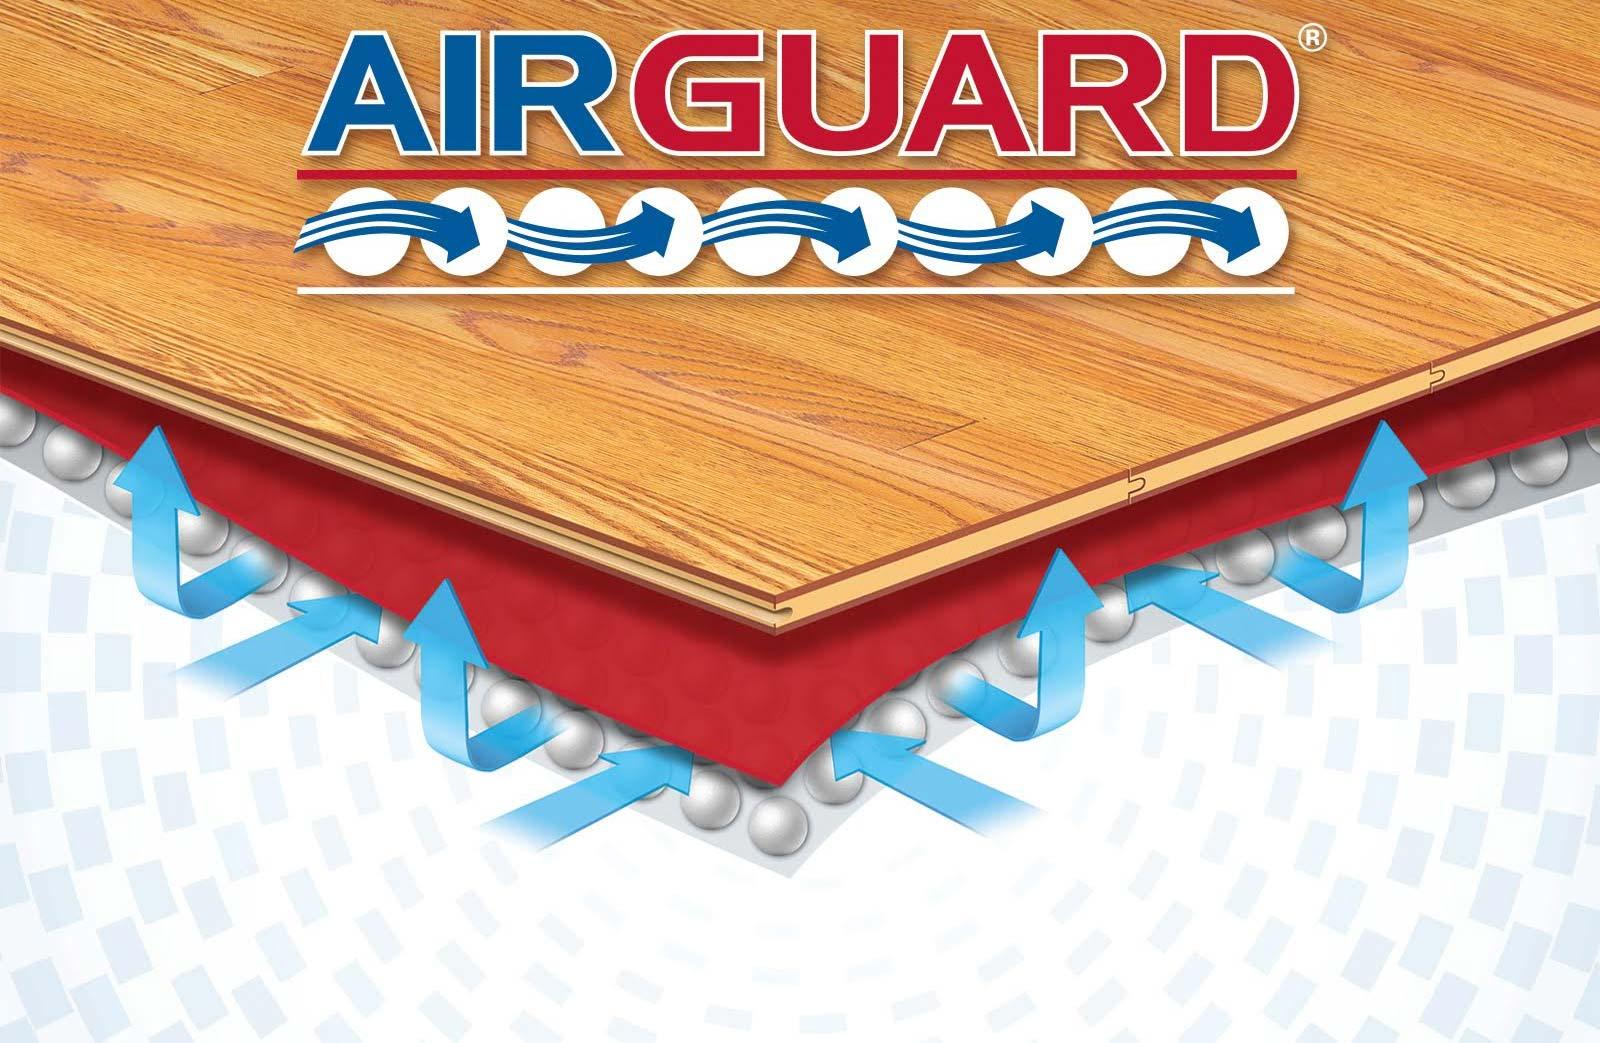 roberts-airguard